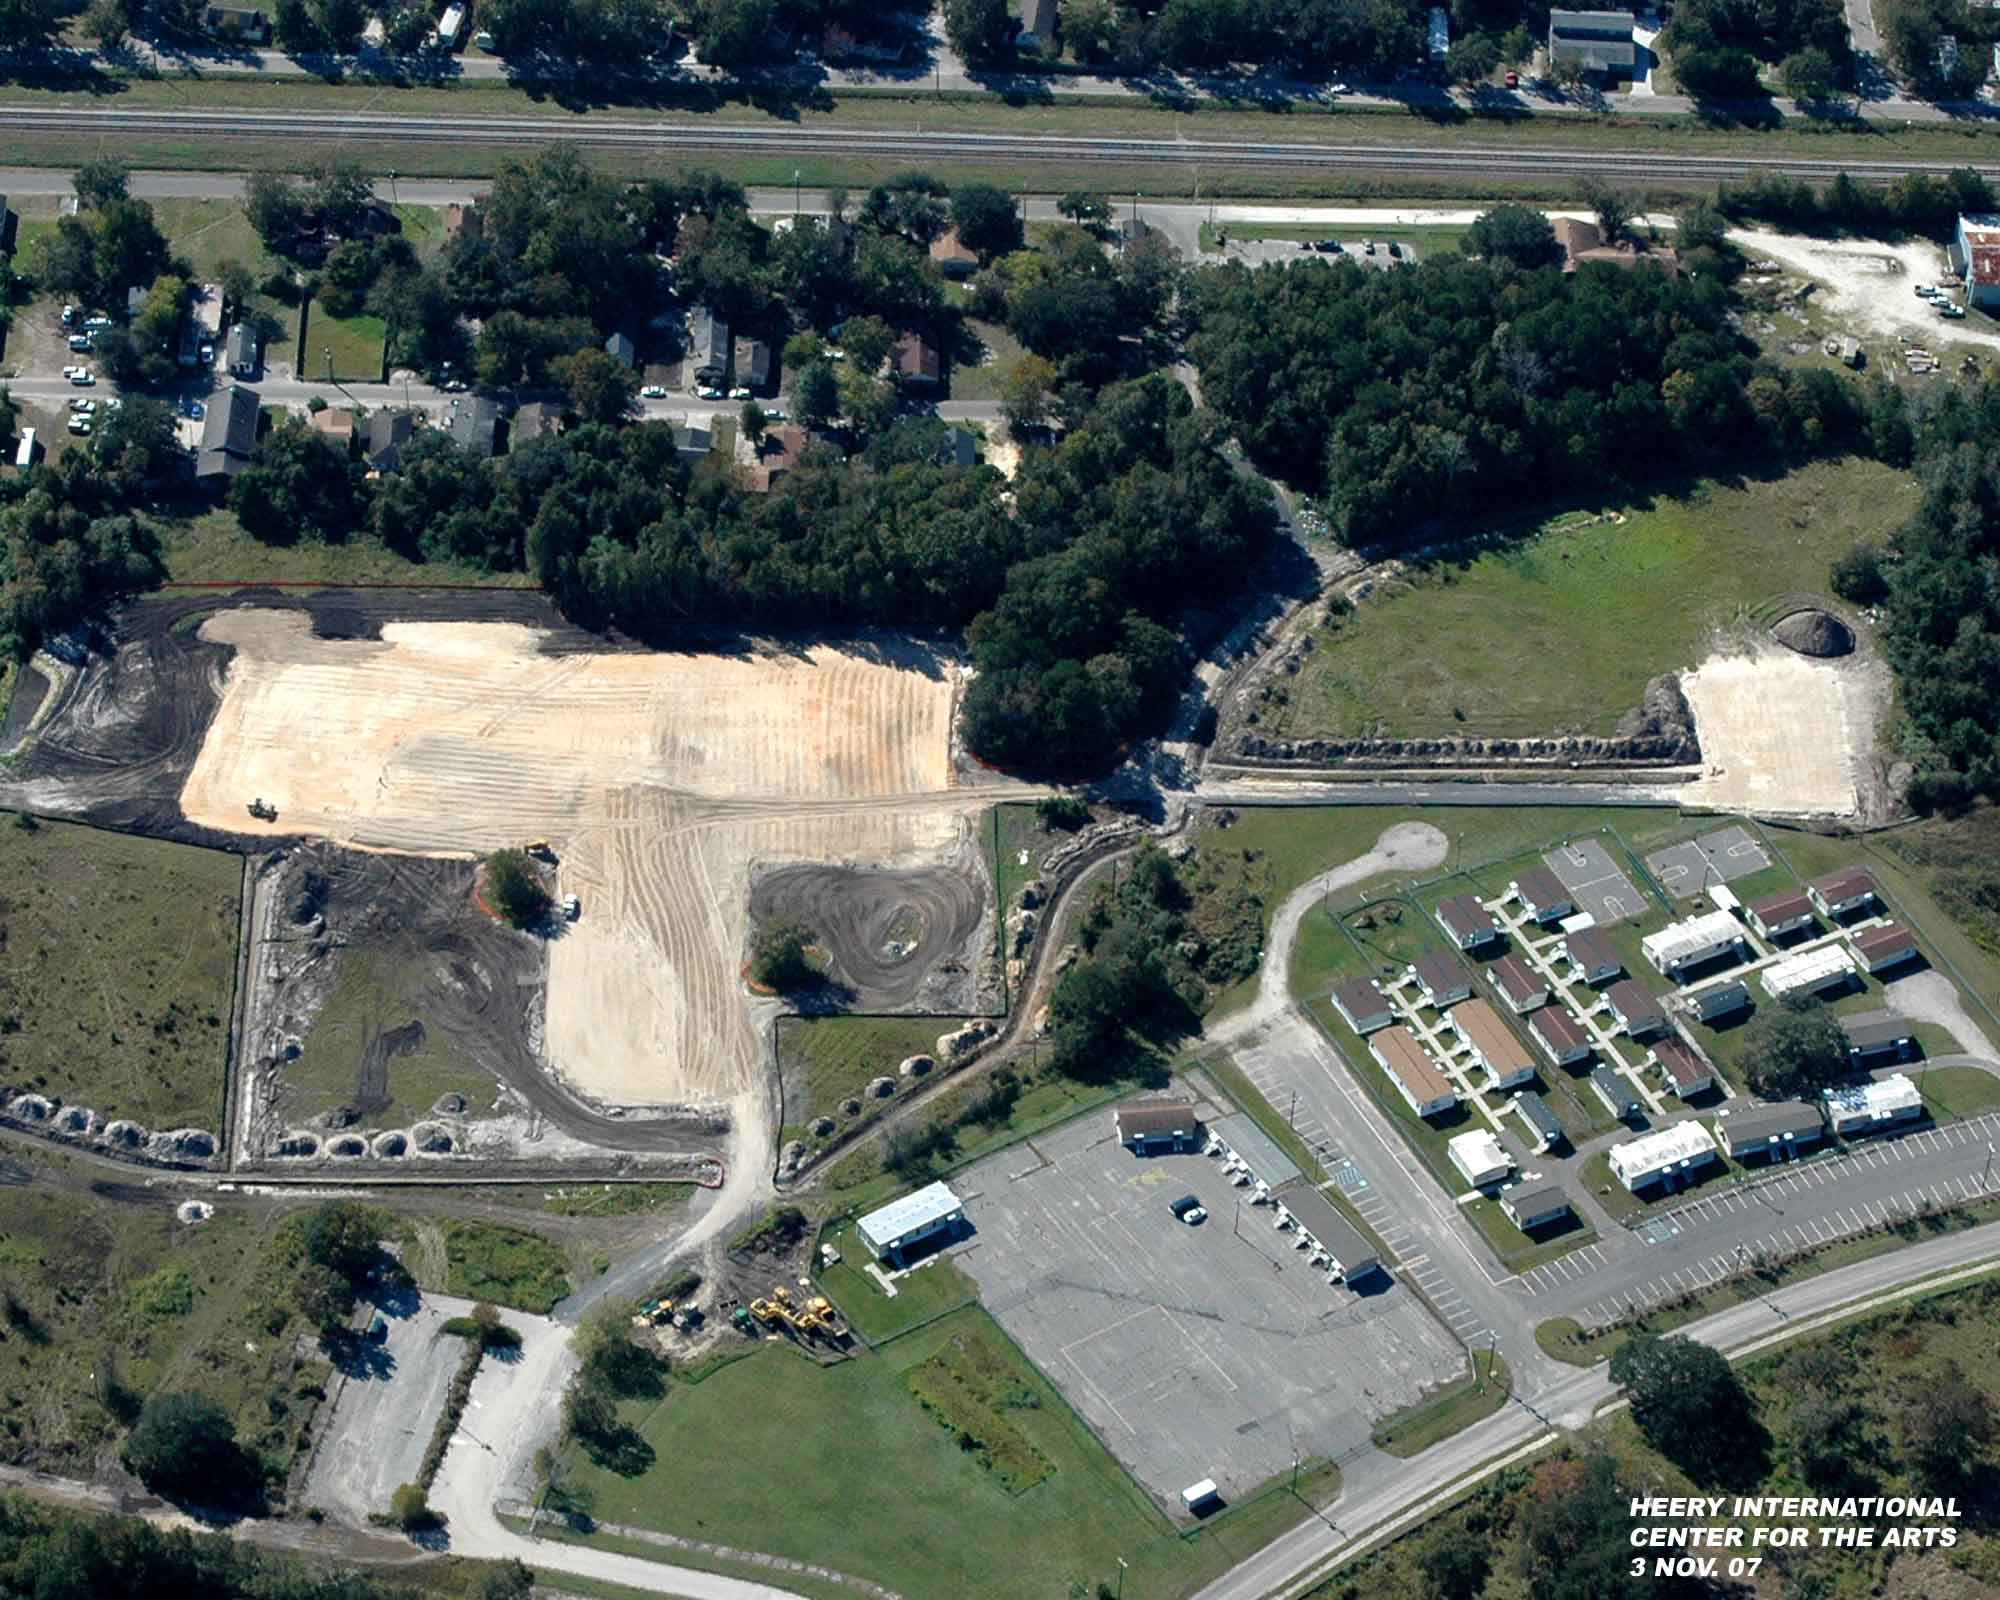 CAA Aerial Photo North Site (11-03-07).jpg